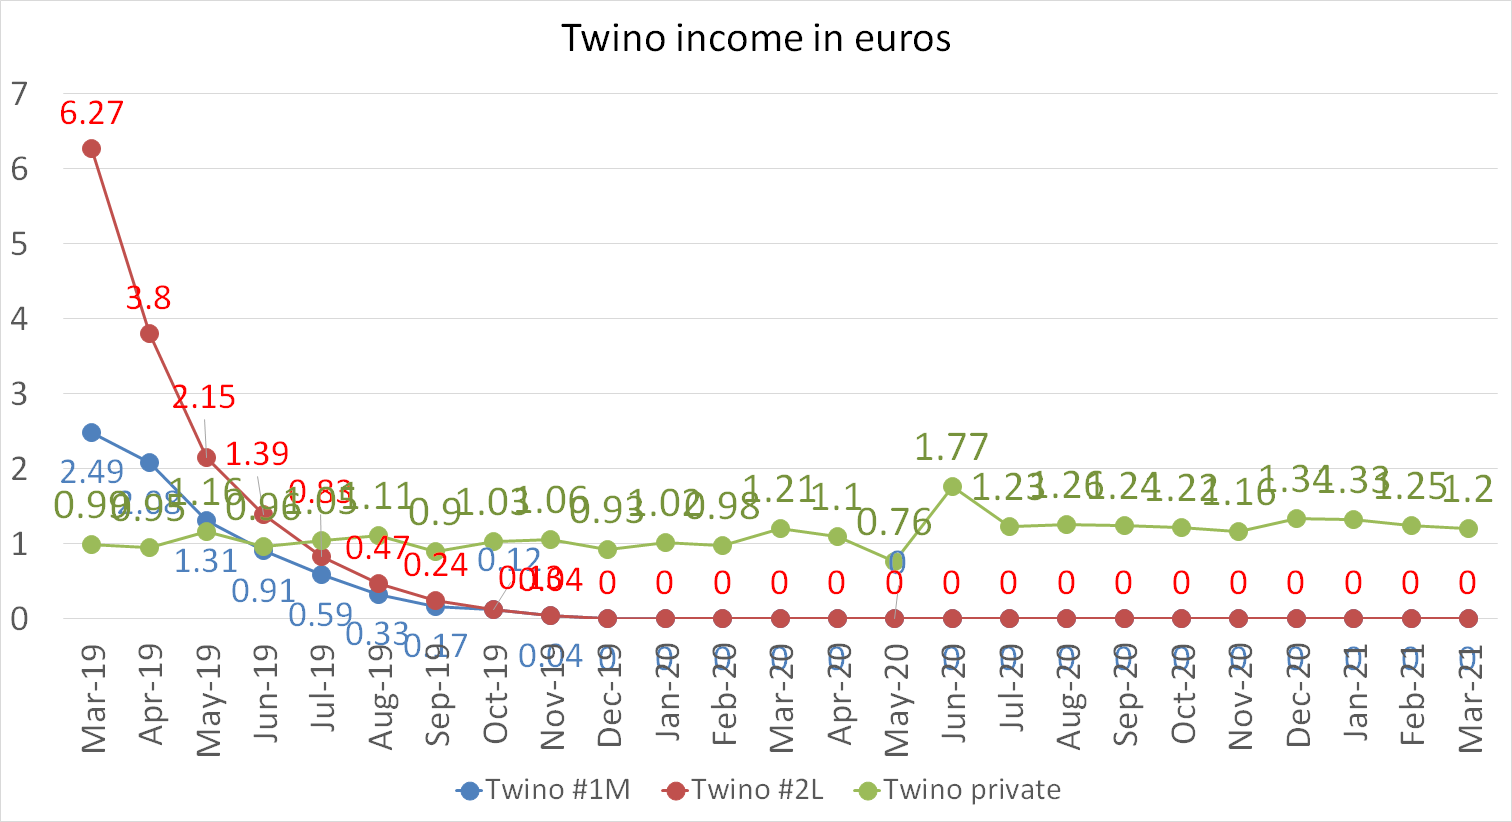 Twino income in euros march 2021